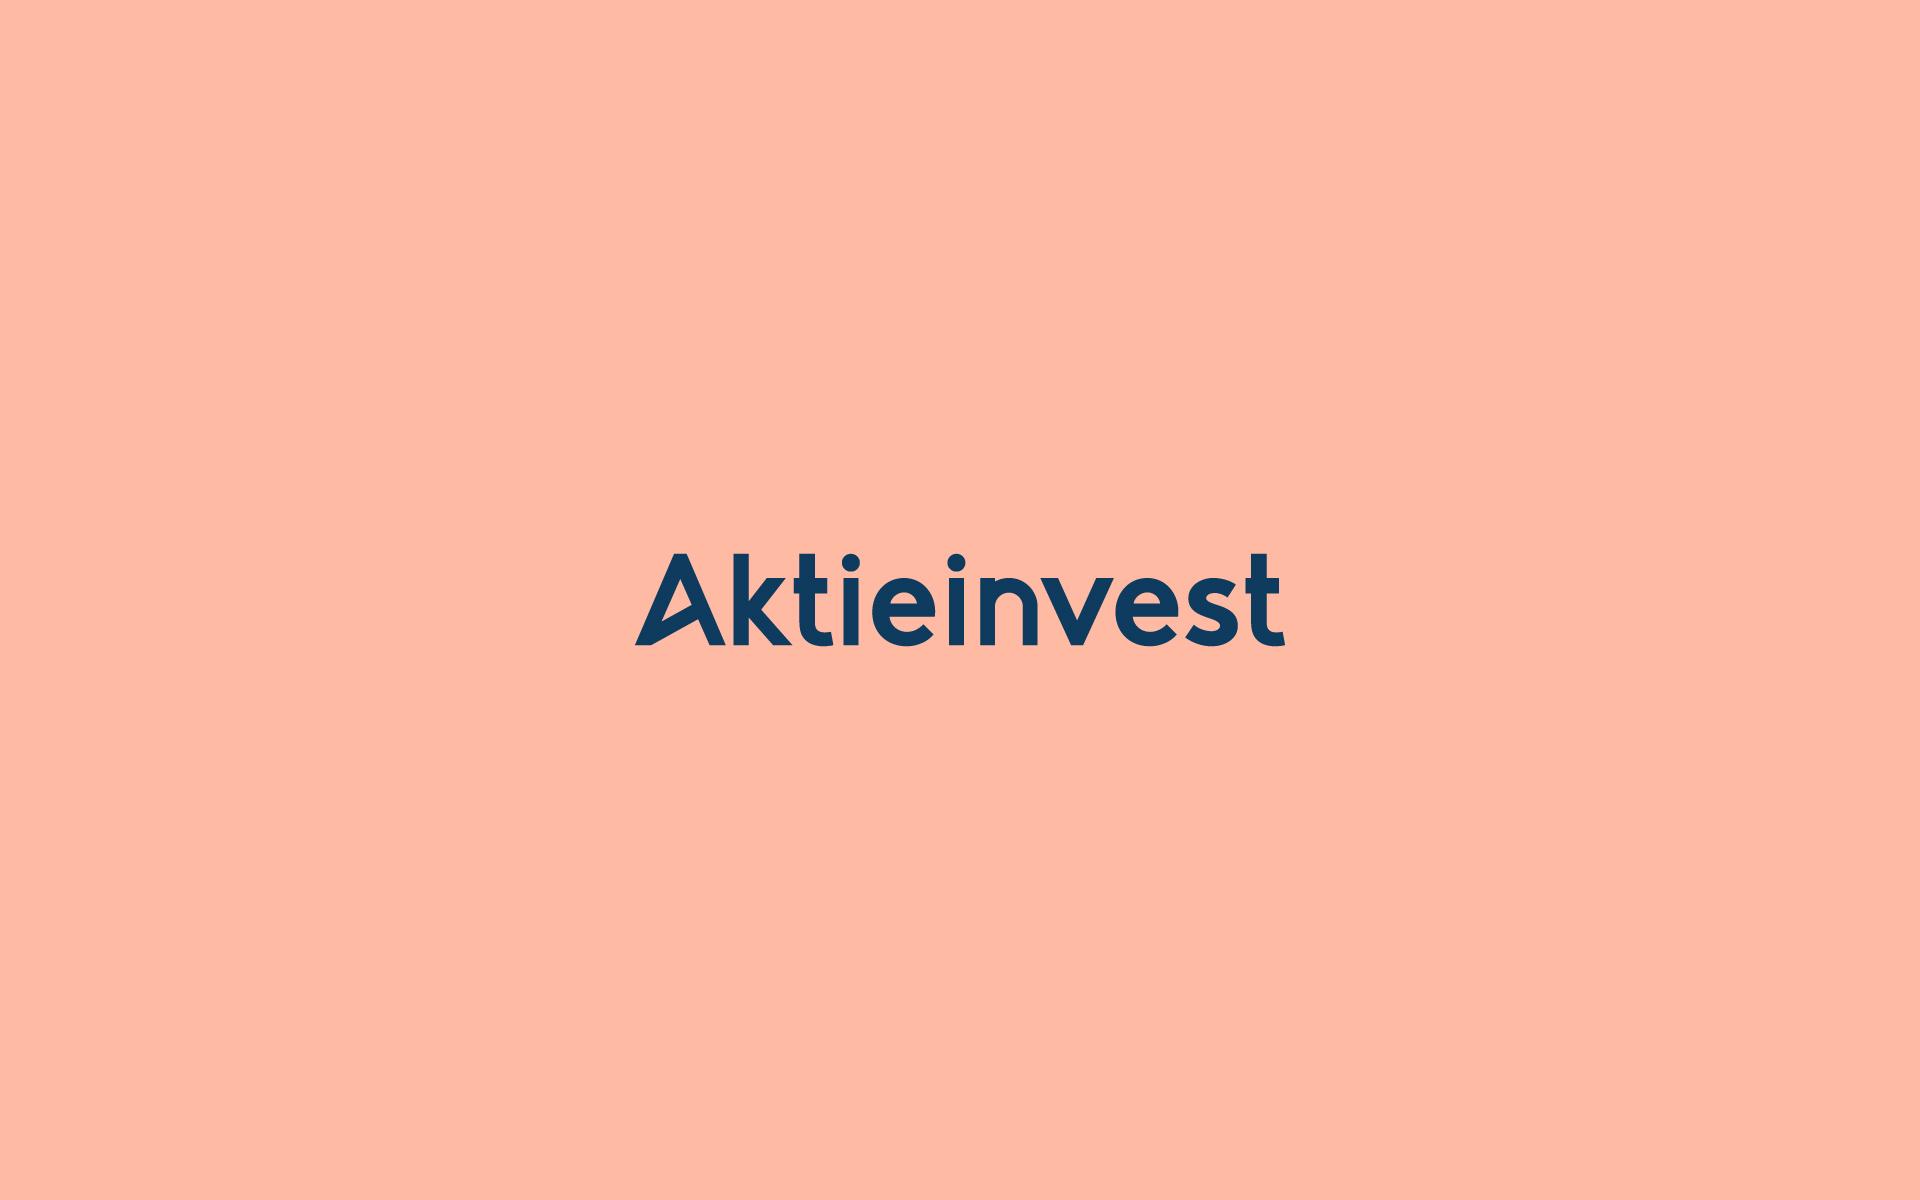 helene-chataigner-aktie-identity-logo-pink-big